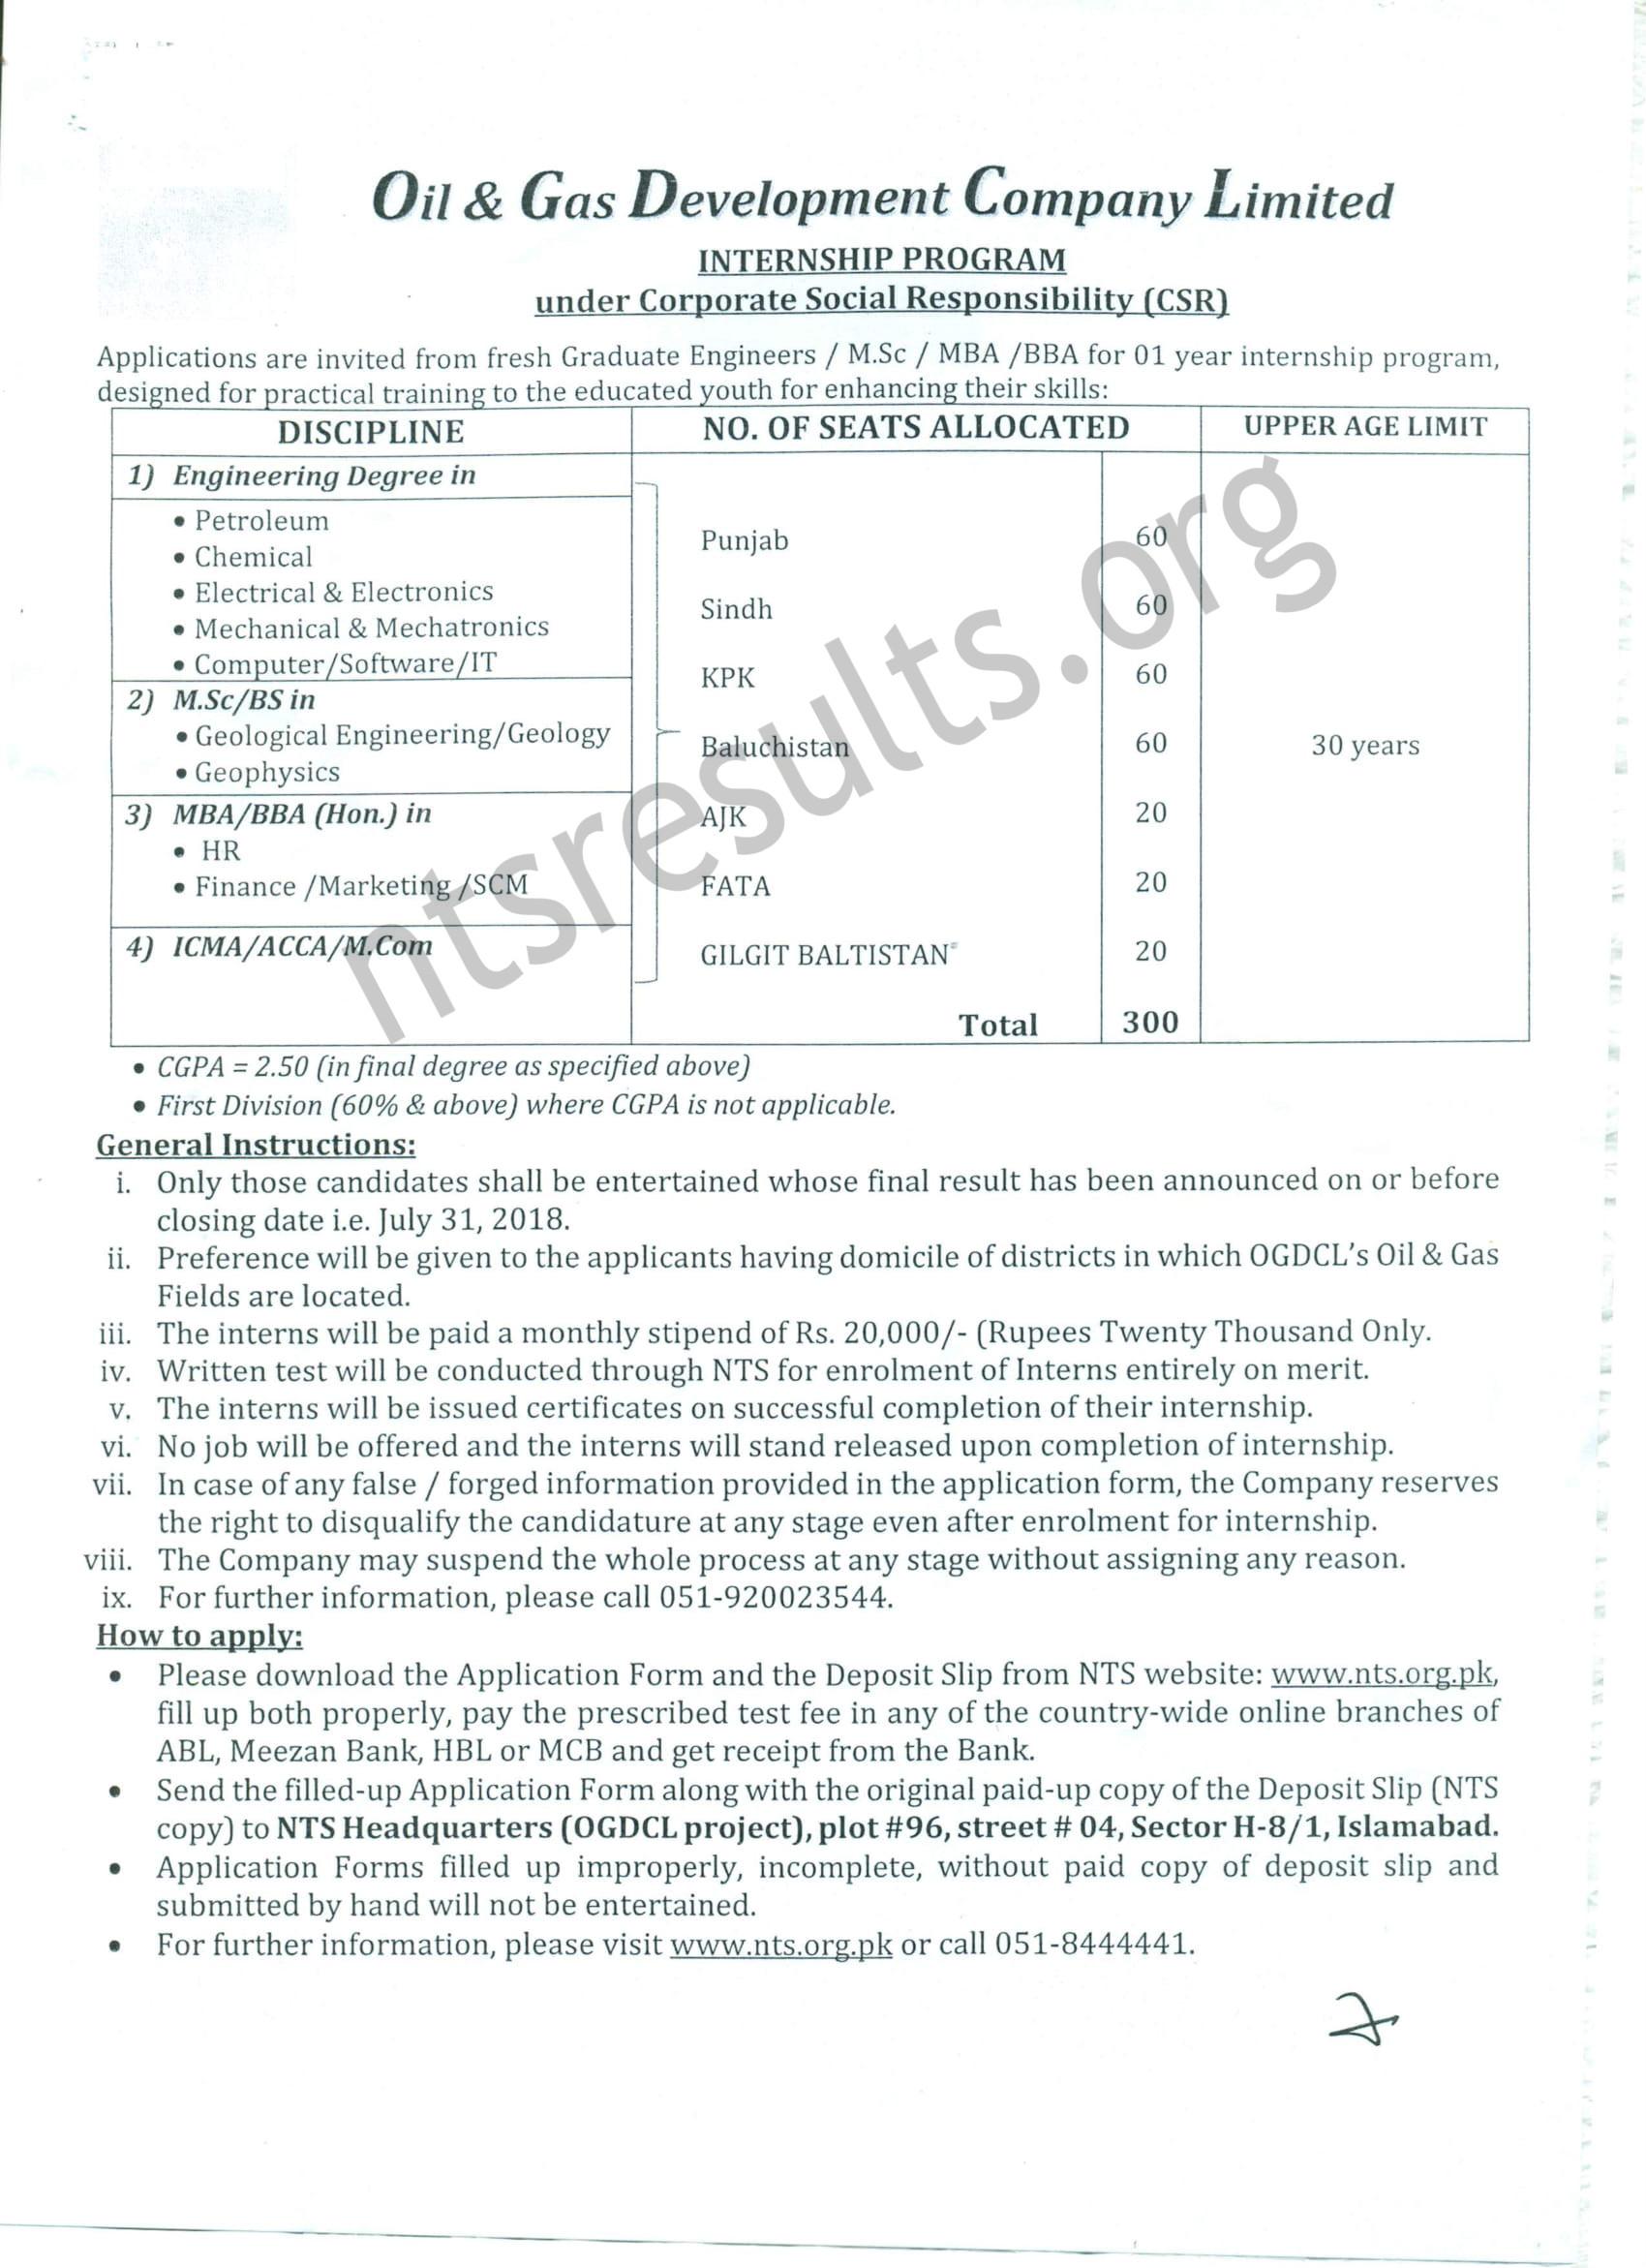 Oil Gas Development Company Limited OGDCL Internship Program Via NTS